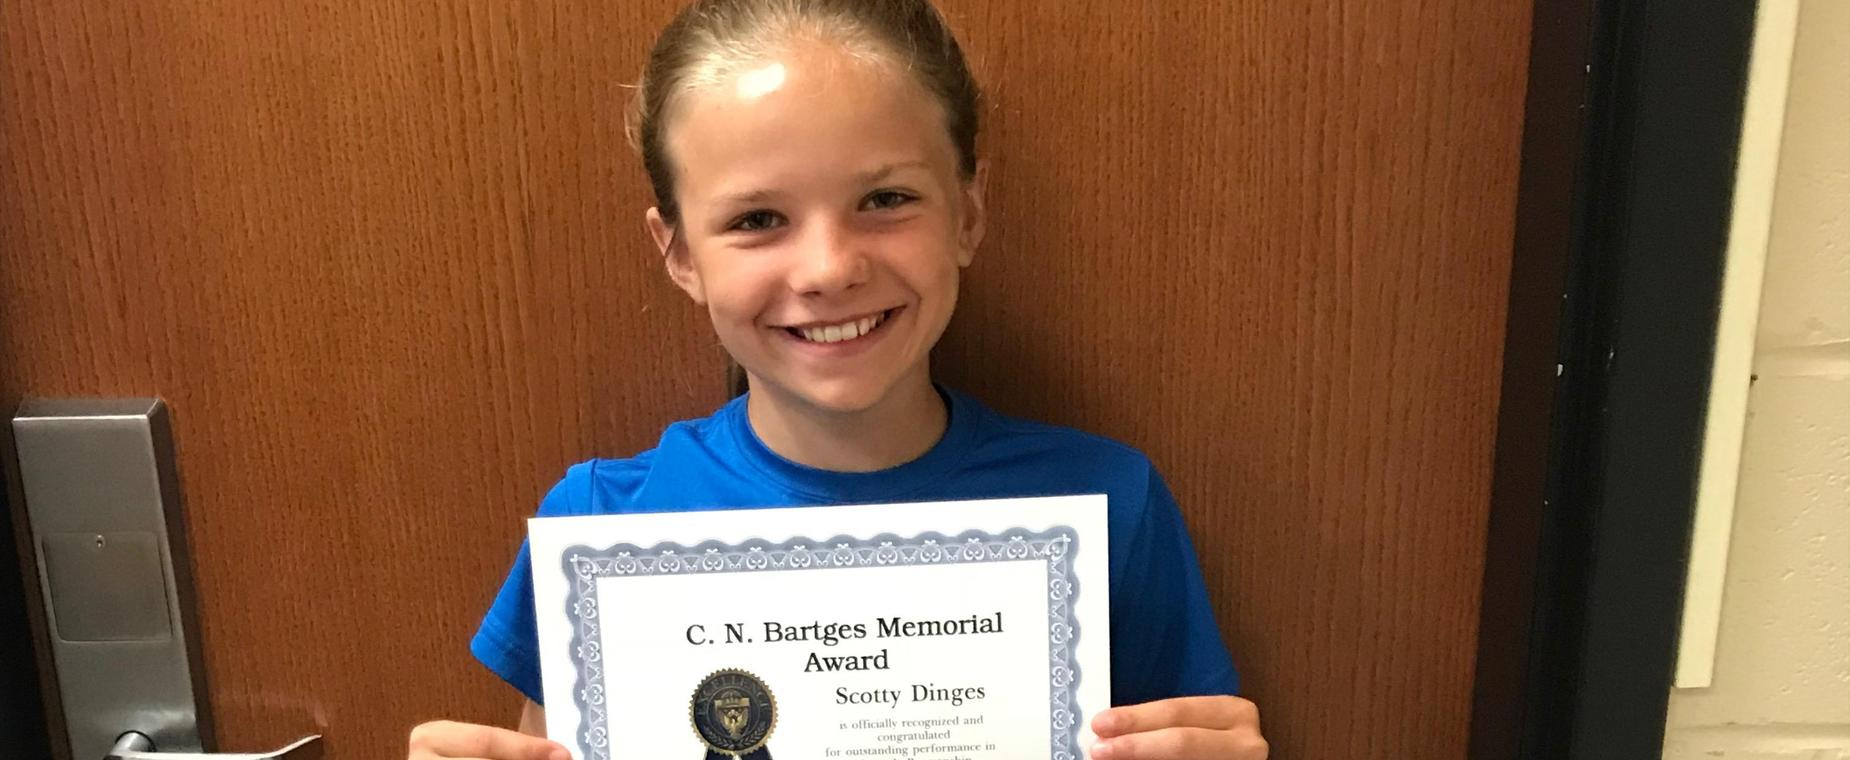 Scotty Dinges - Bartges Award Winner